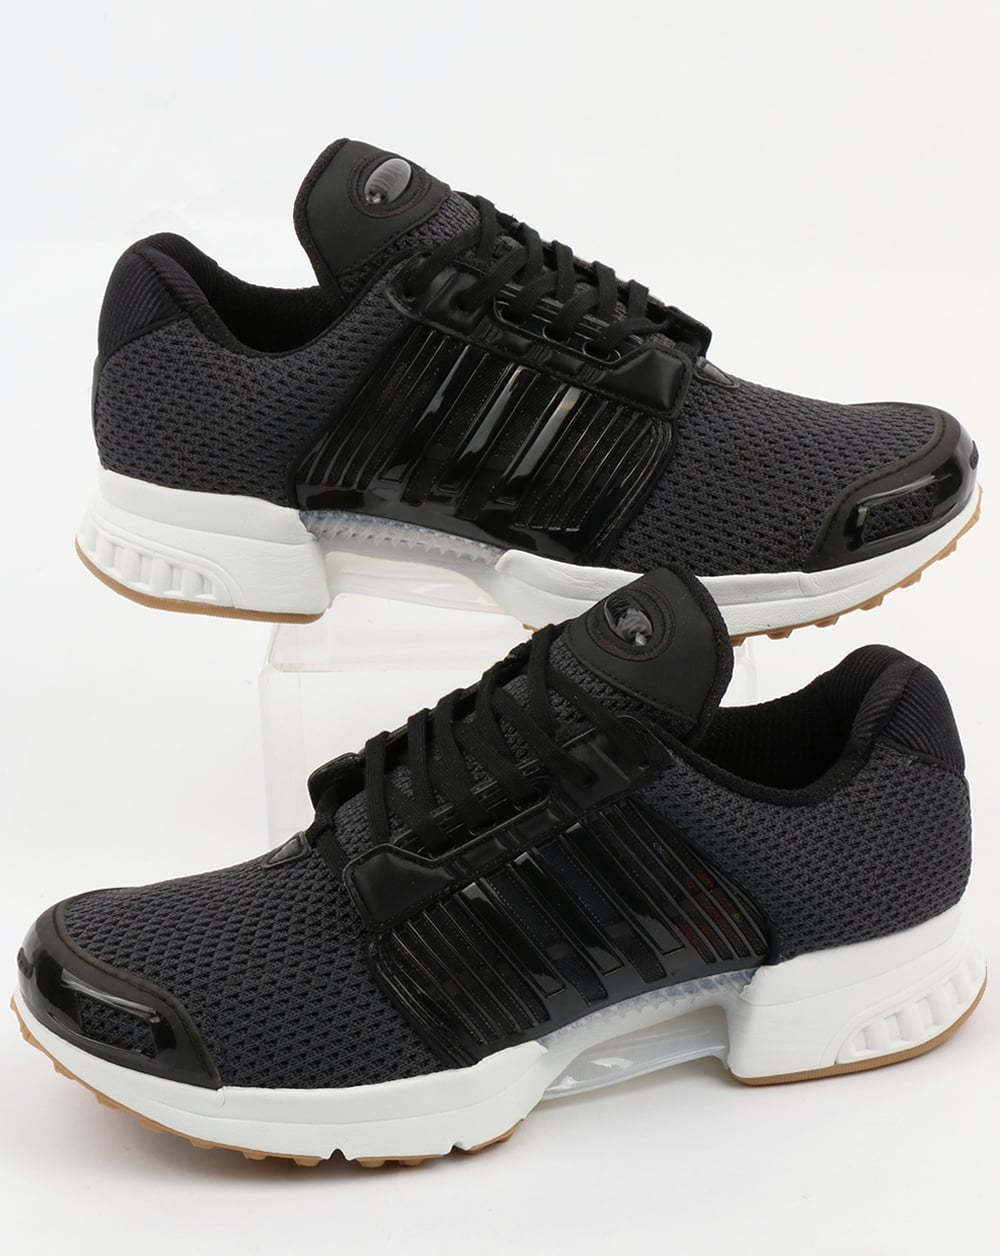 adidas Trainers Adidas Climacool 1 Trainers Copper Flat Black ba9e2c4da